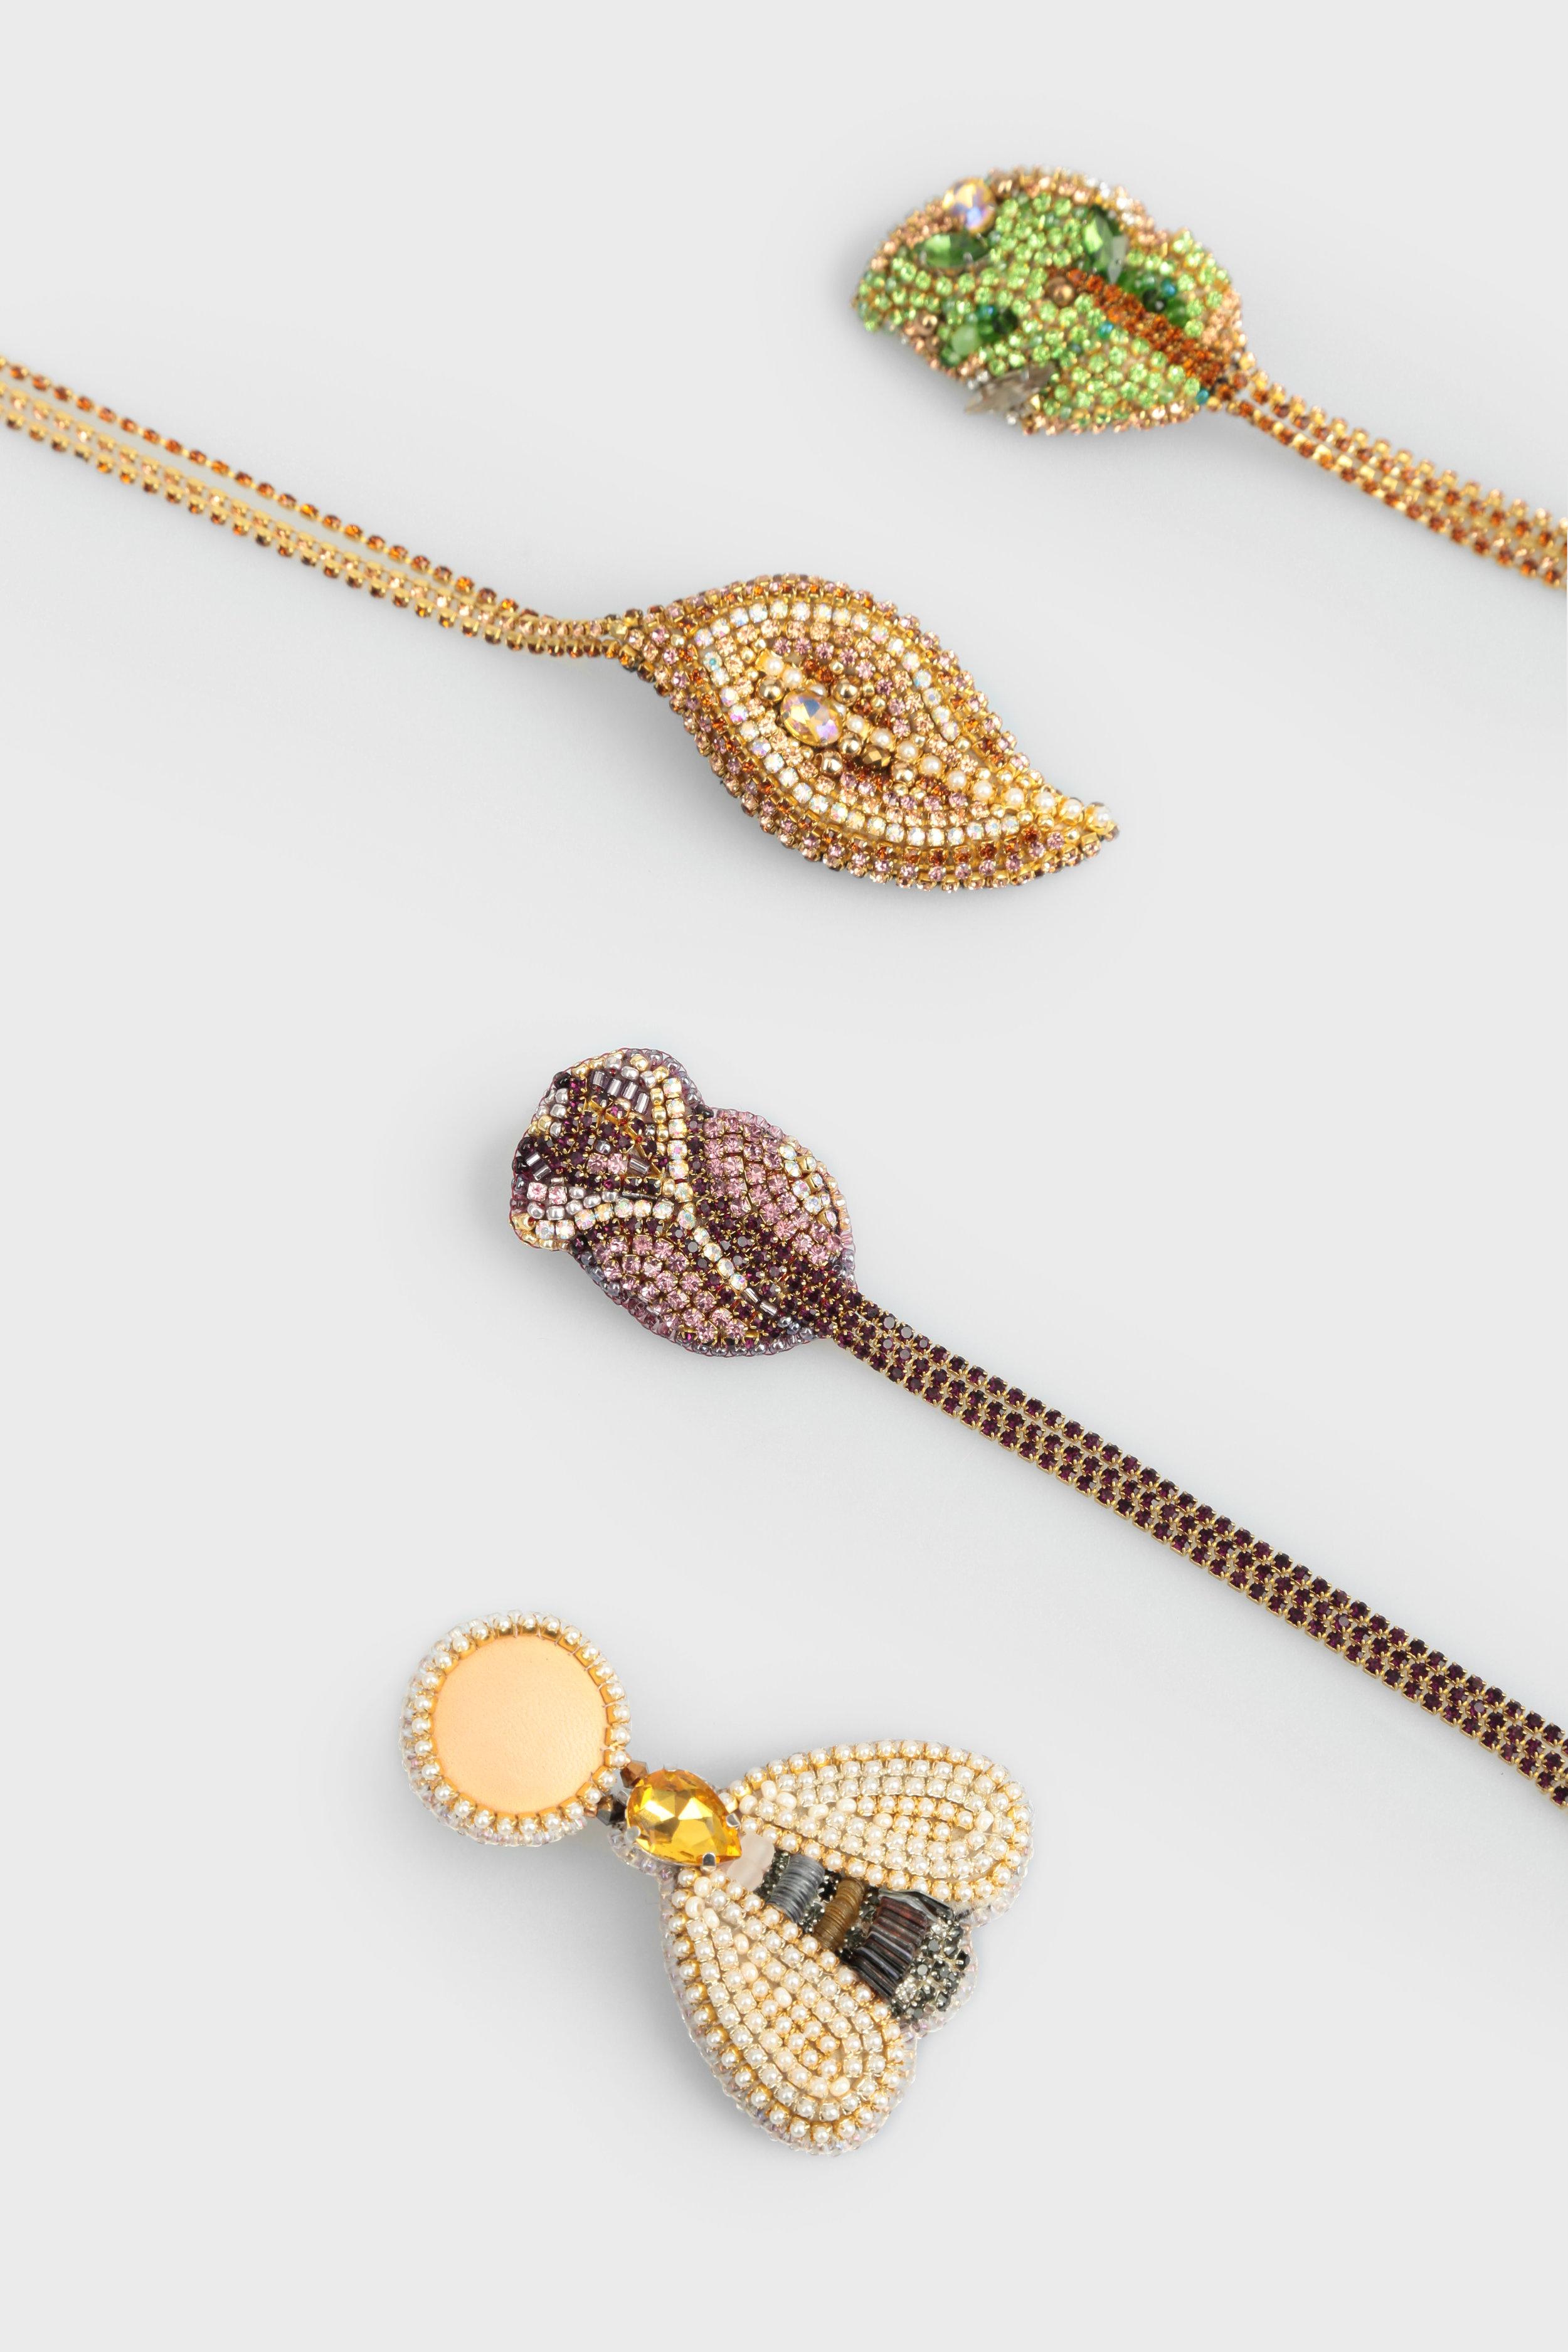 Lada Legina Jewelry.JPG